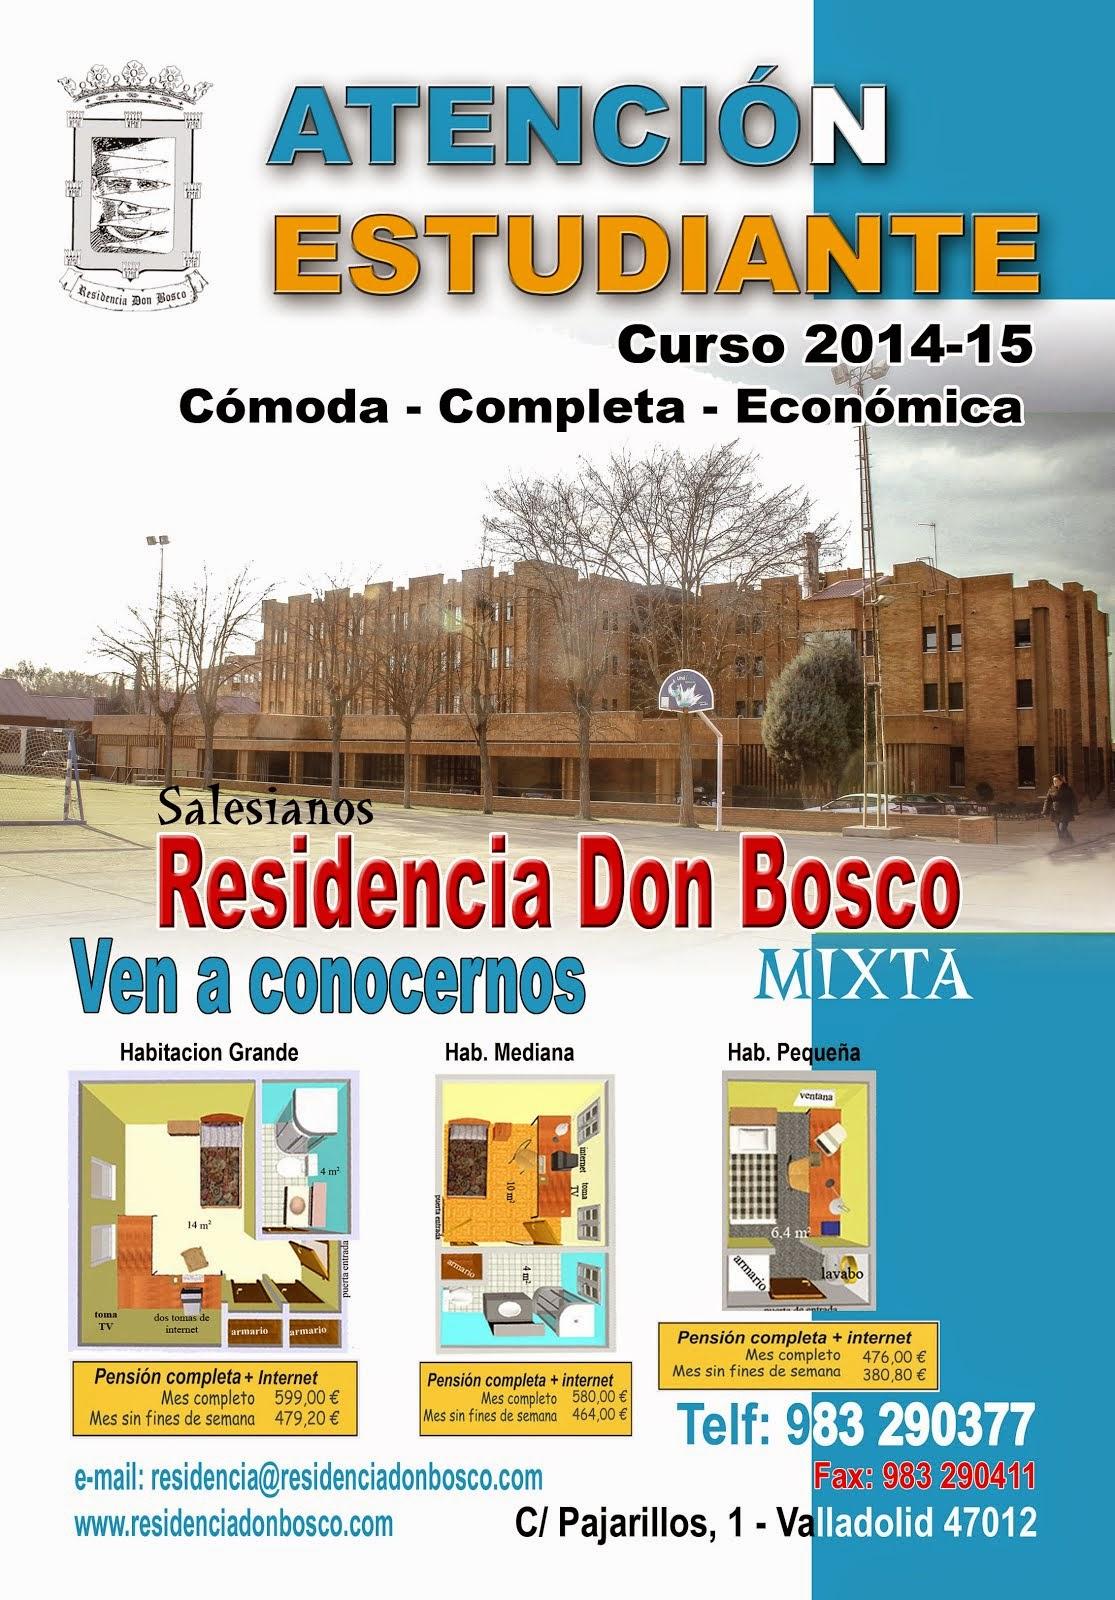 RESIDENCIA DON BOSCO. VA